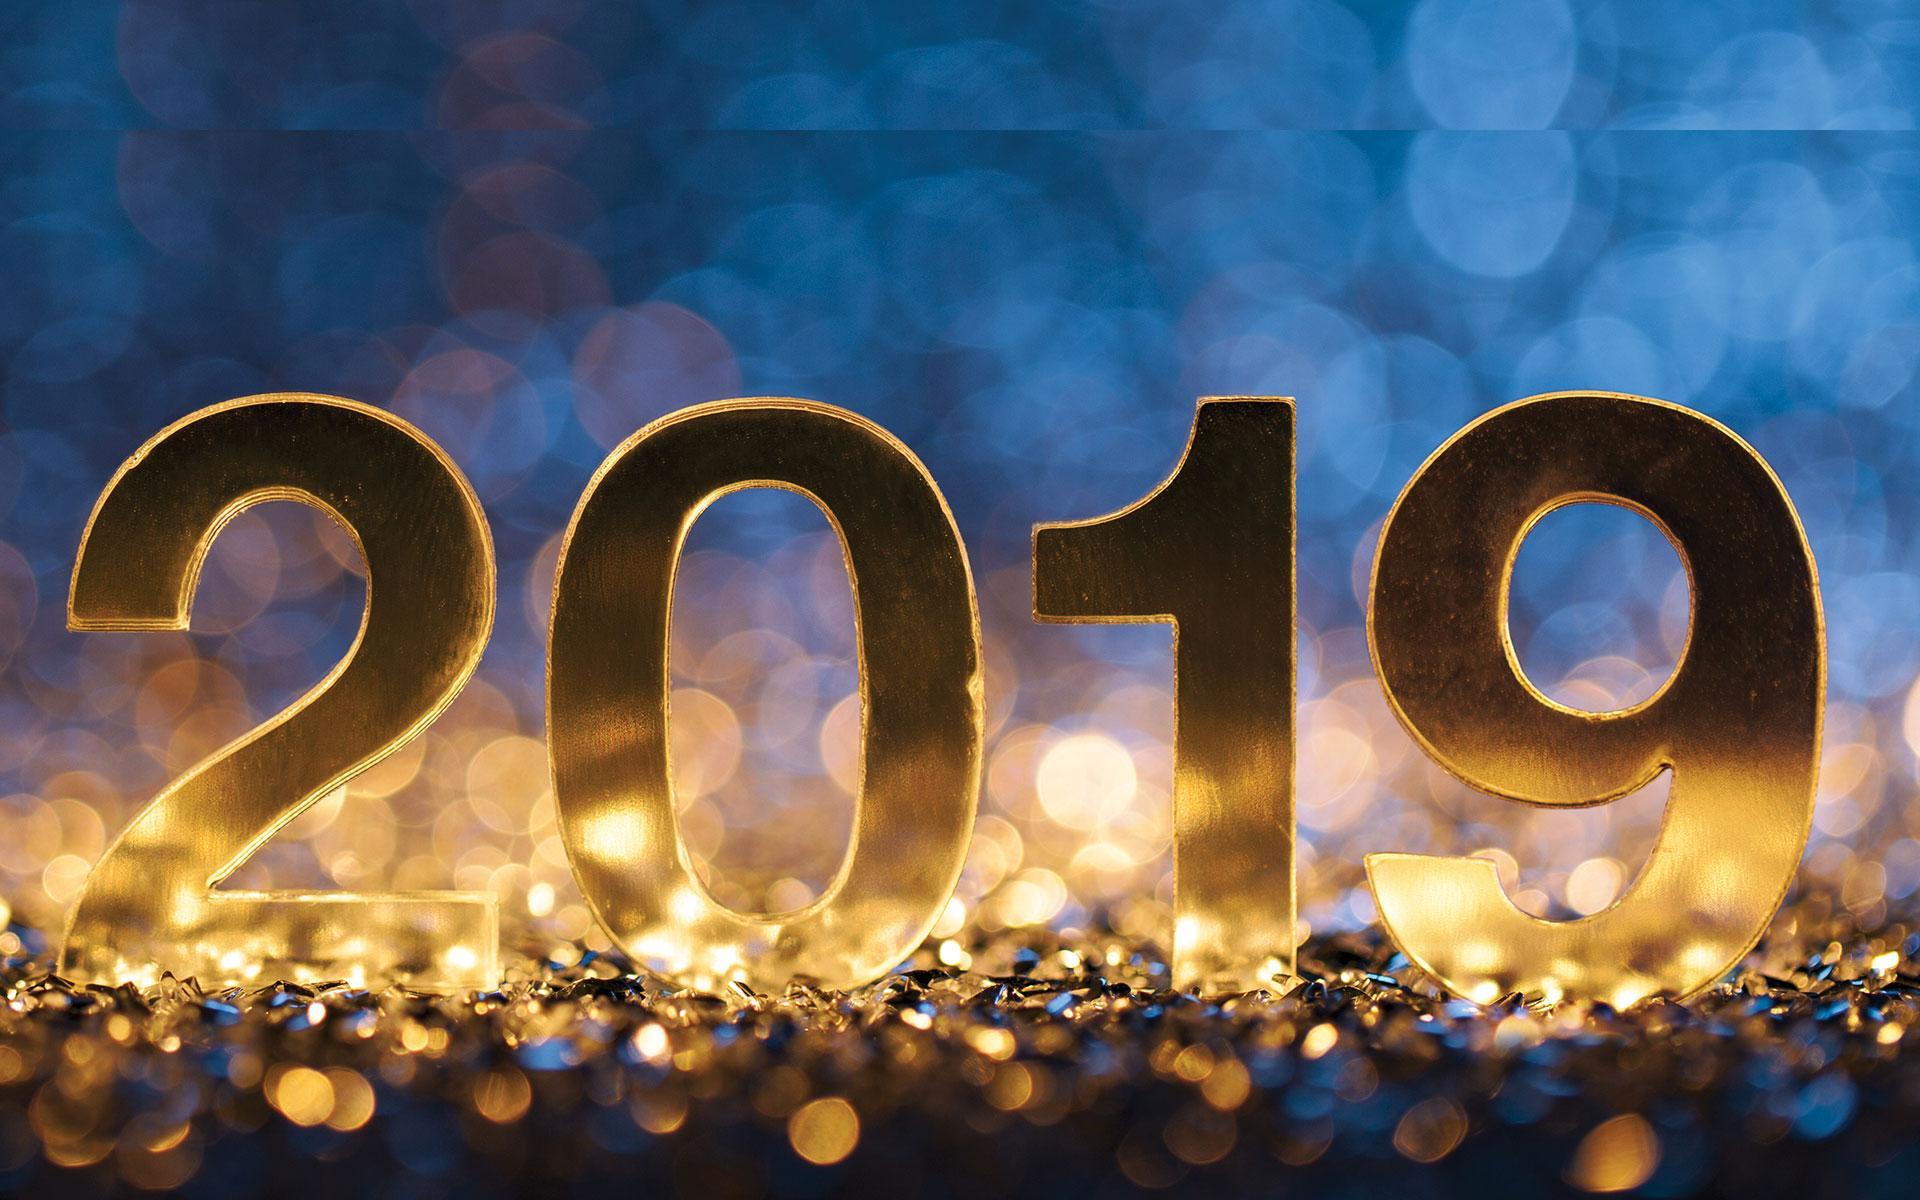 Meilleurs vœux 2019